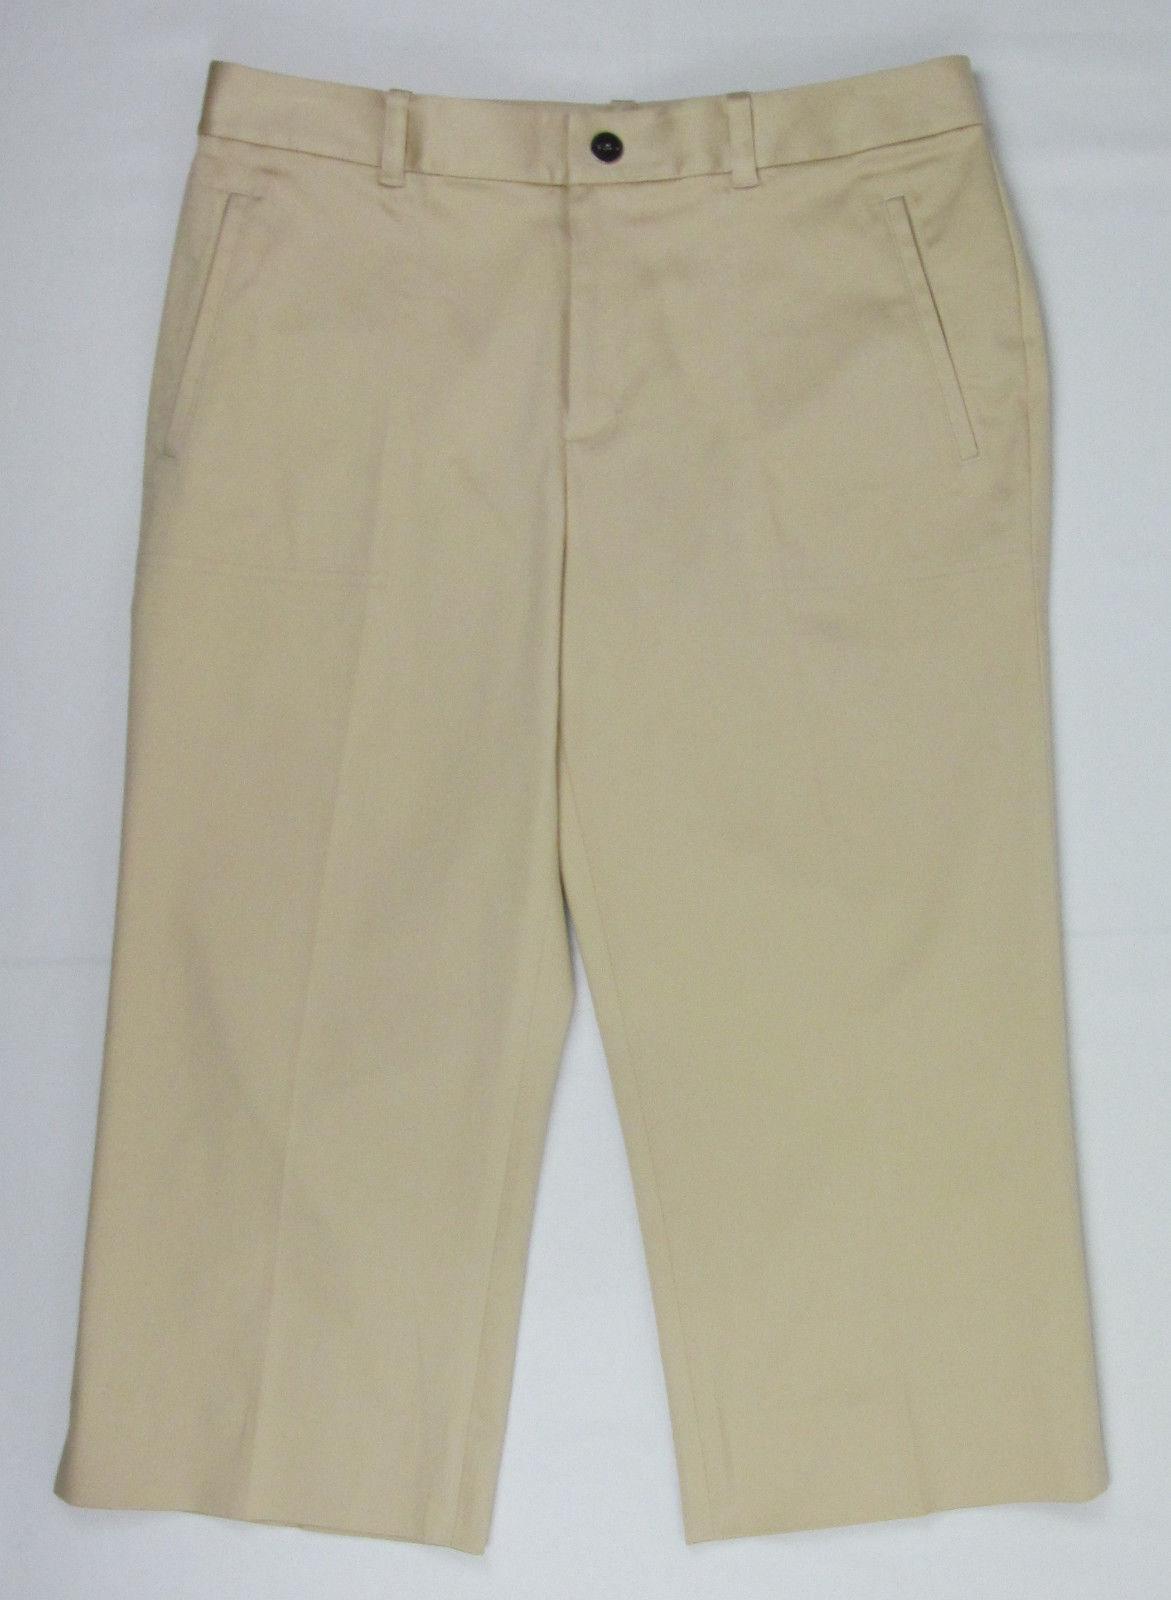 NWT Ralph Lauren Sport Capri pants Tan ( Straw Blonde ) Womens Size 12 - $29.65